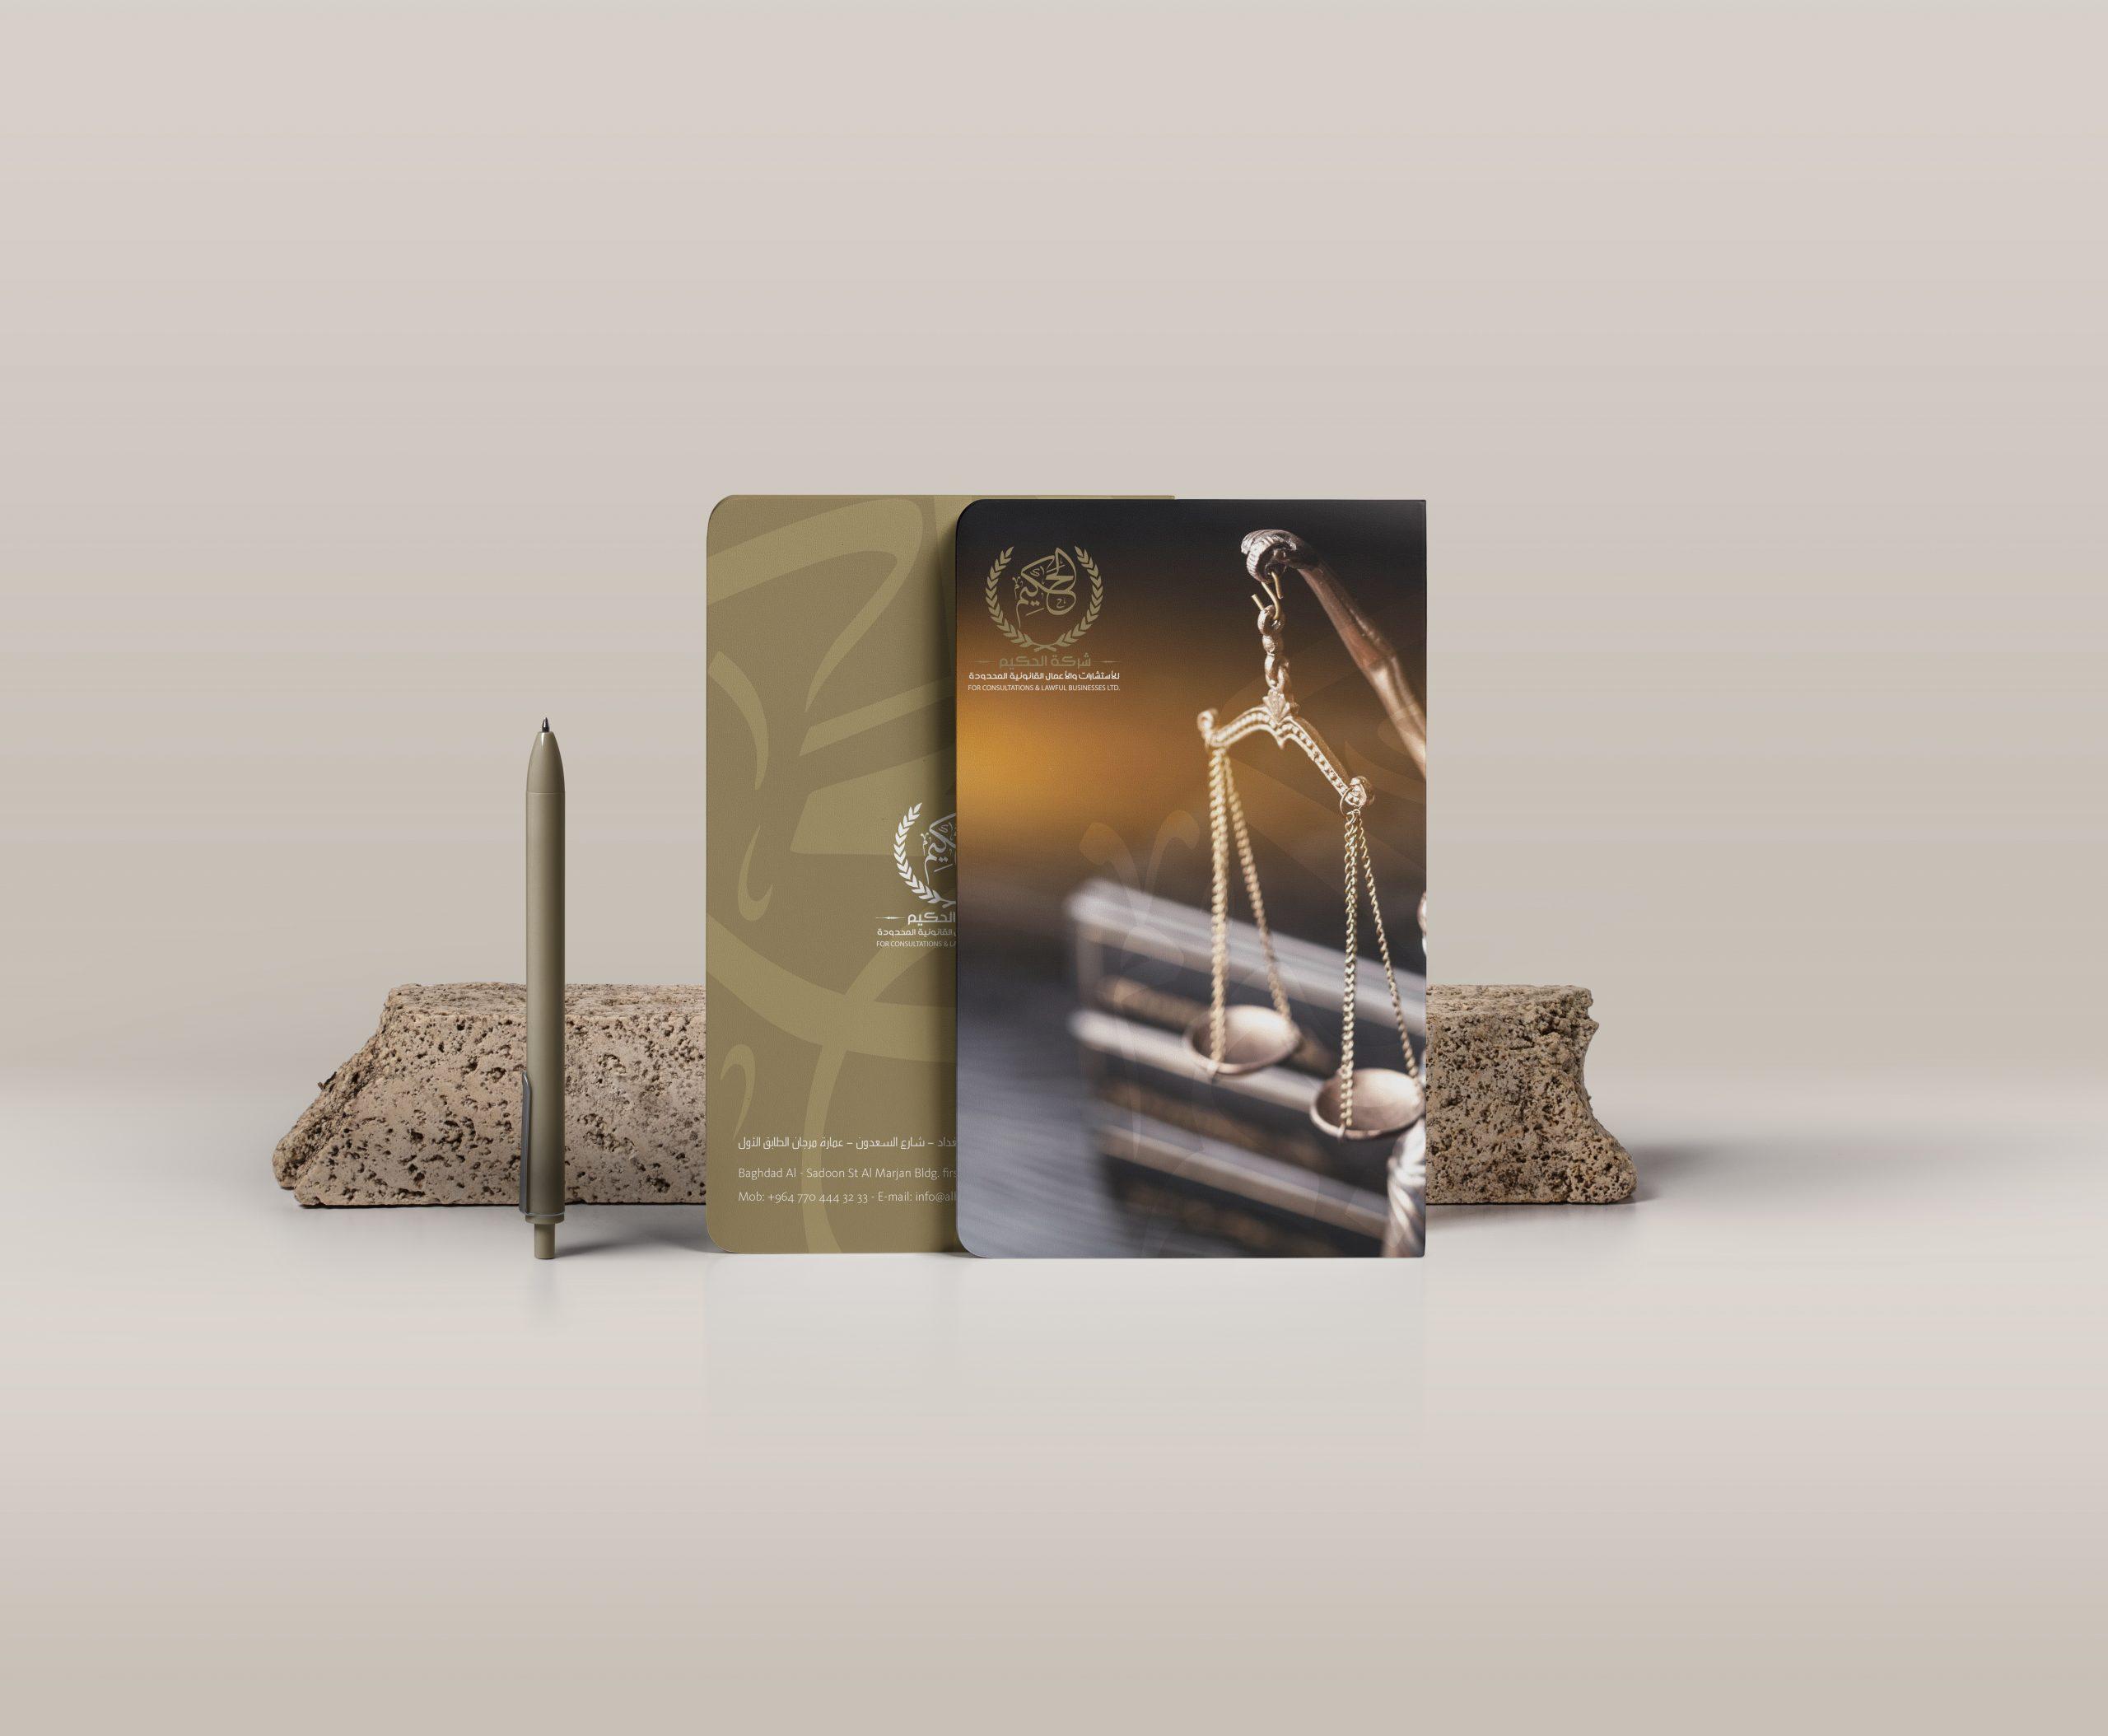 Alhakeemlaw notebook